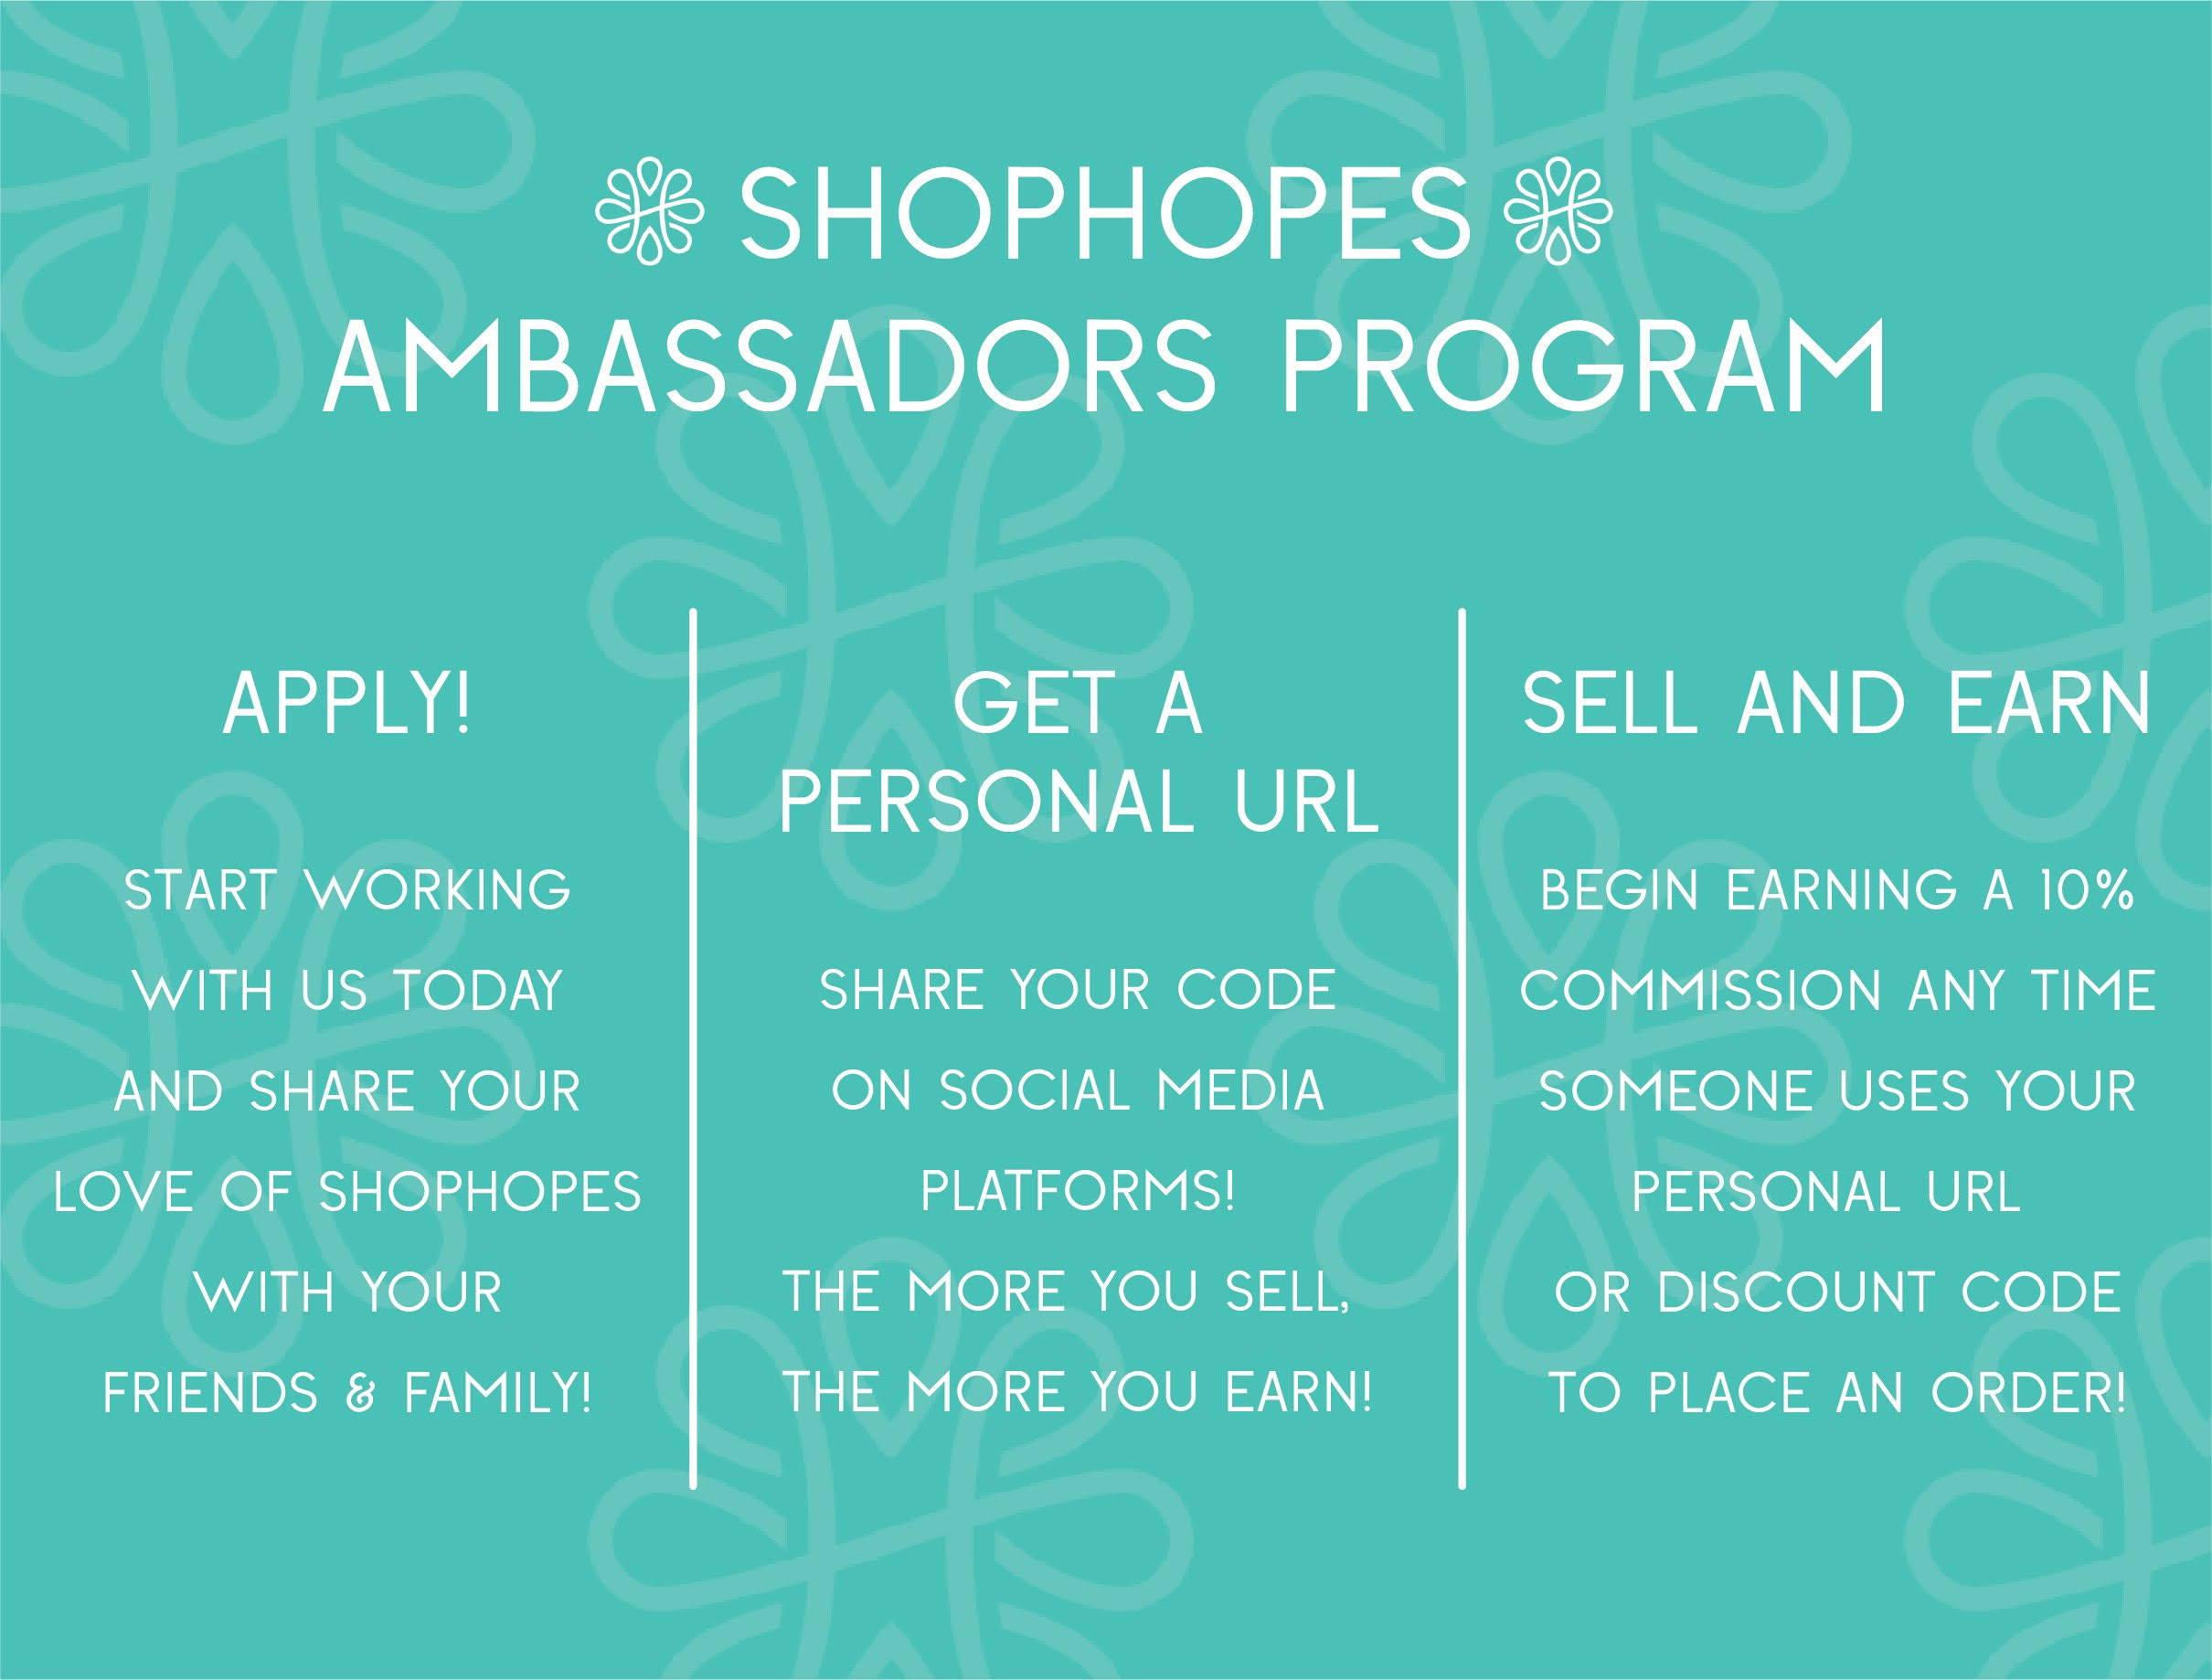 Shophopes Ambassadors Program